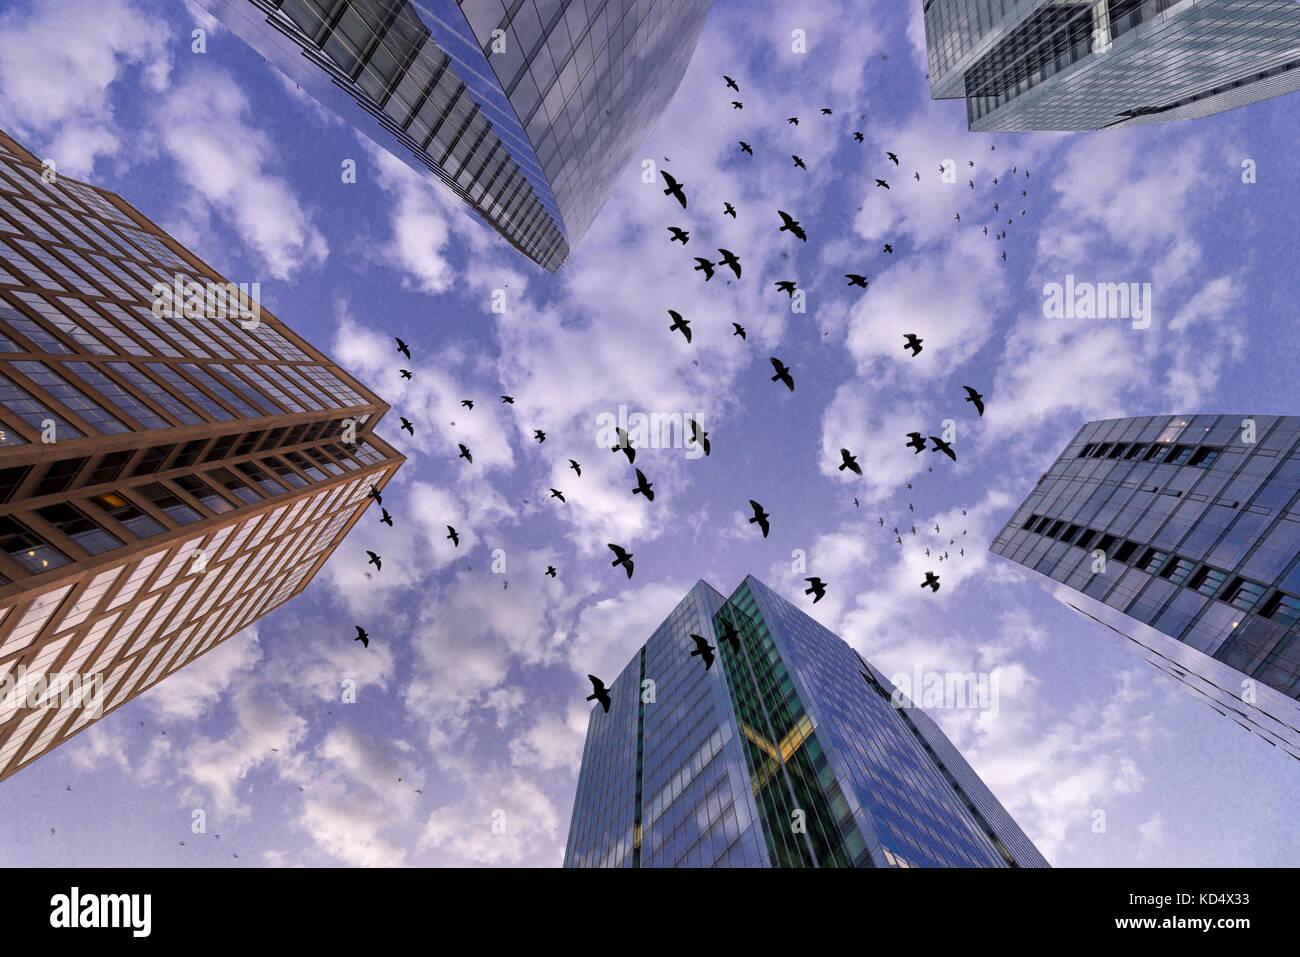 Flock Of Black Birds Flying Between Skyscrapers Buildings, Arlington, Virginia, USA - Stock Image